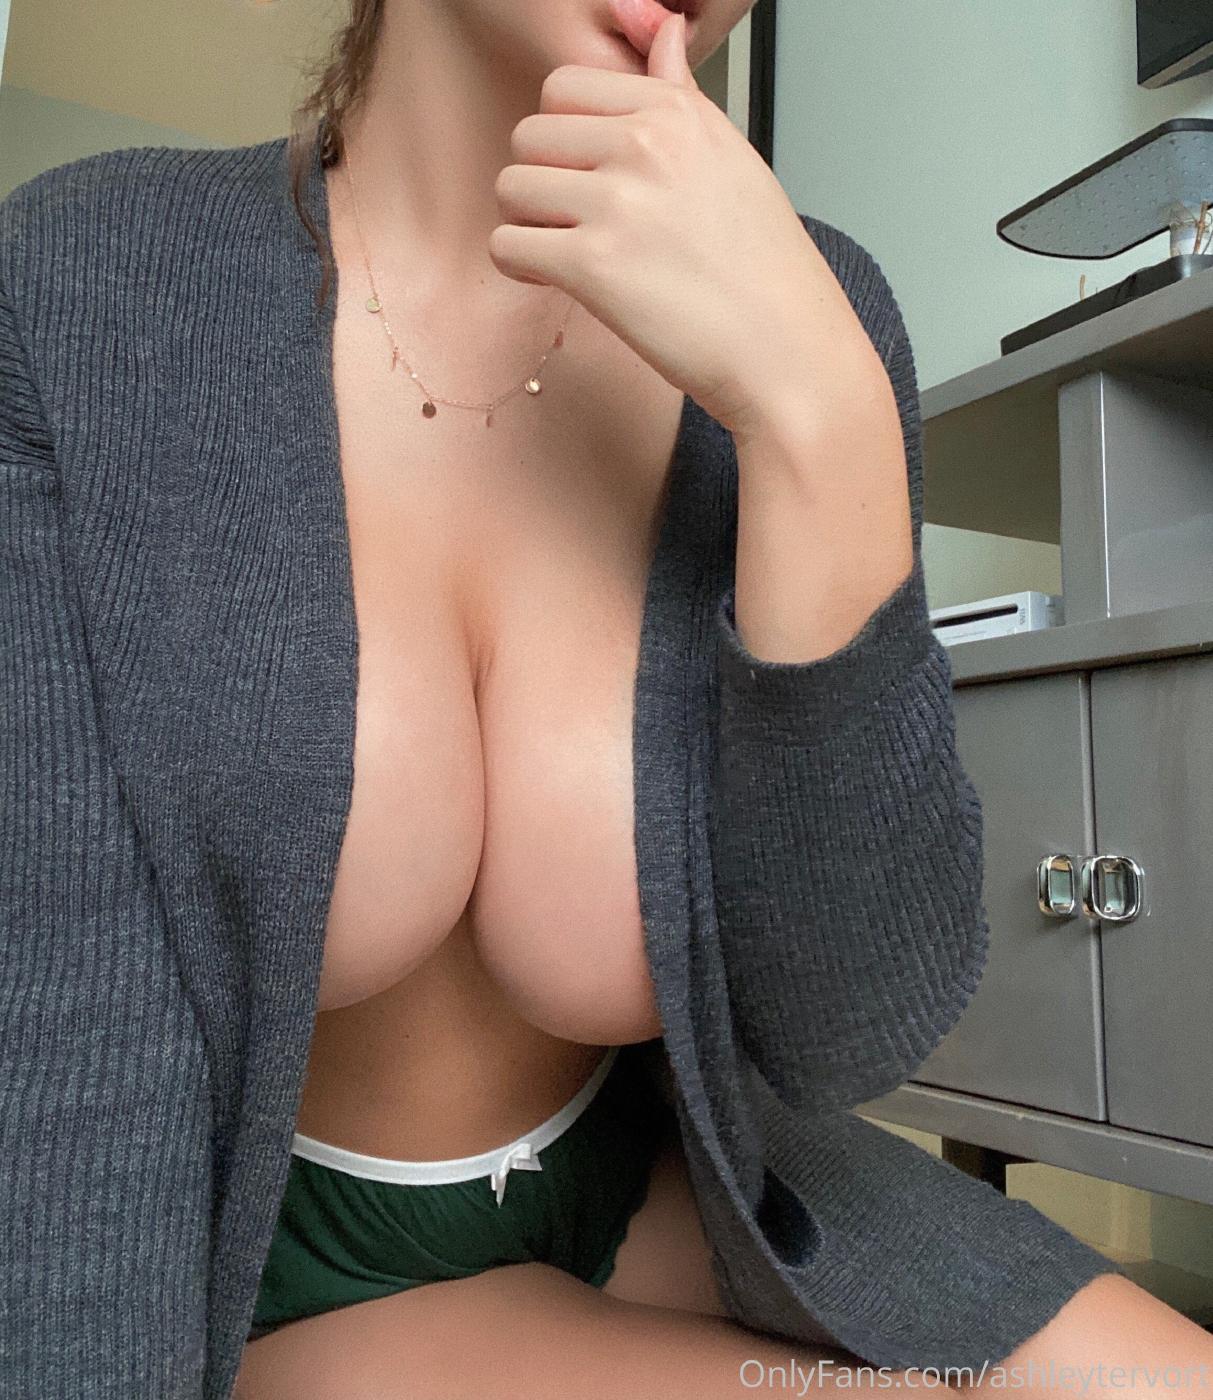 Ashley Tervort Sexy Outfits Onlyfans Set Leaked Gqpjtz